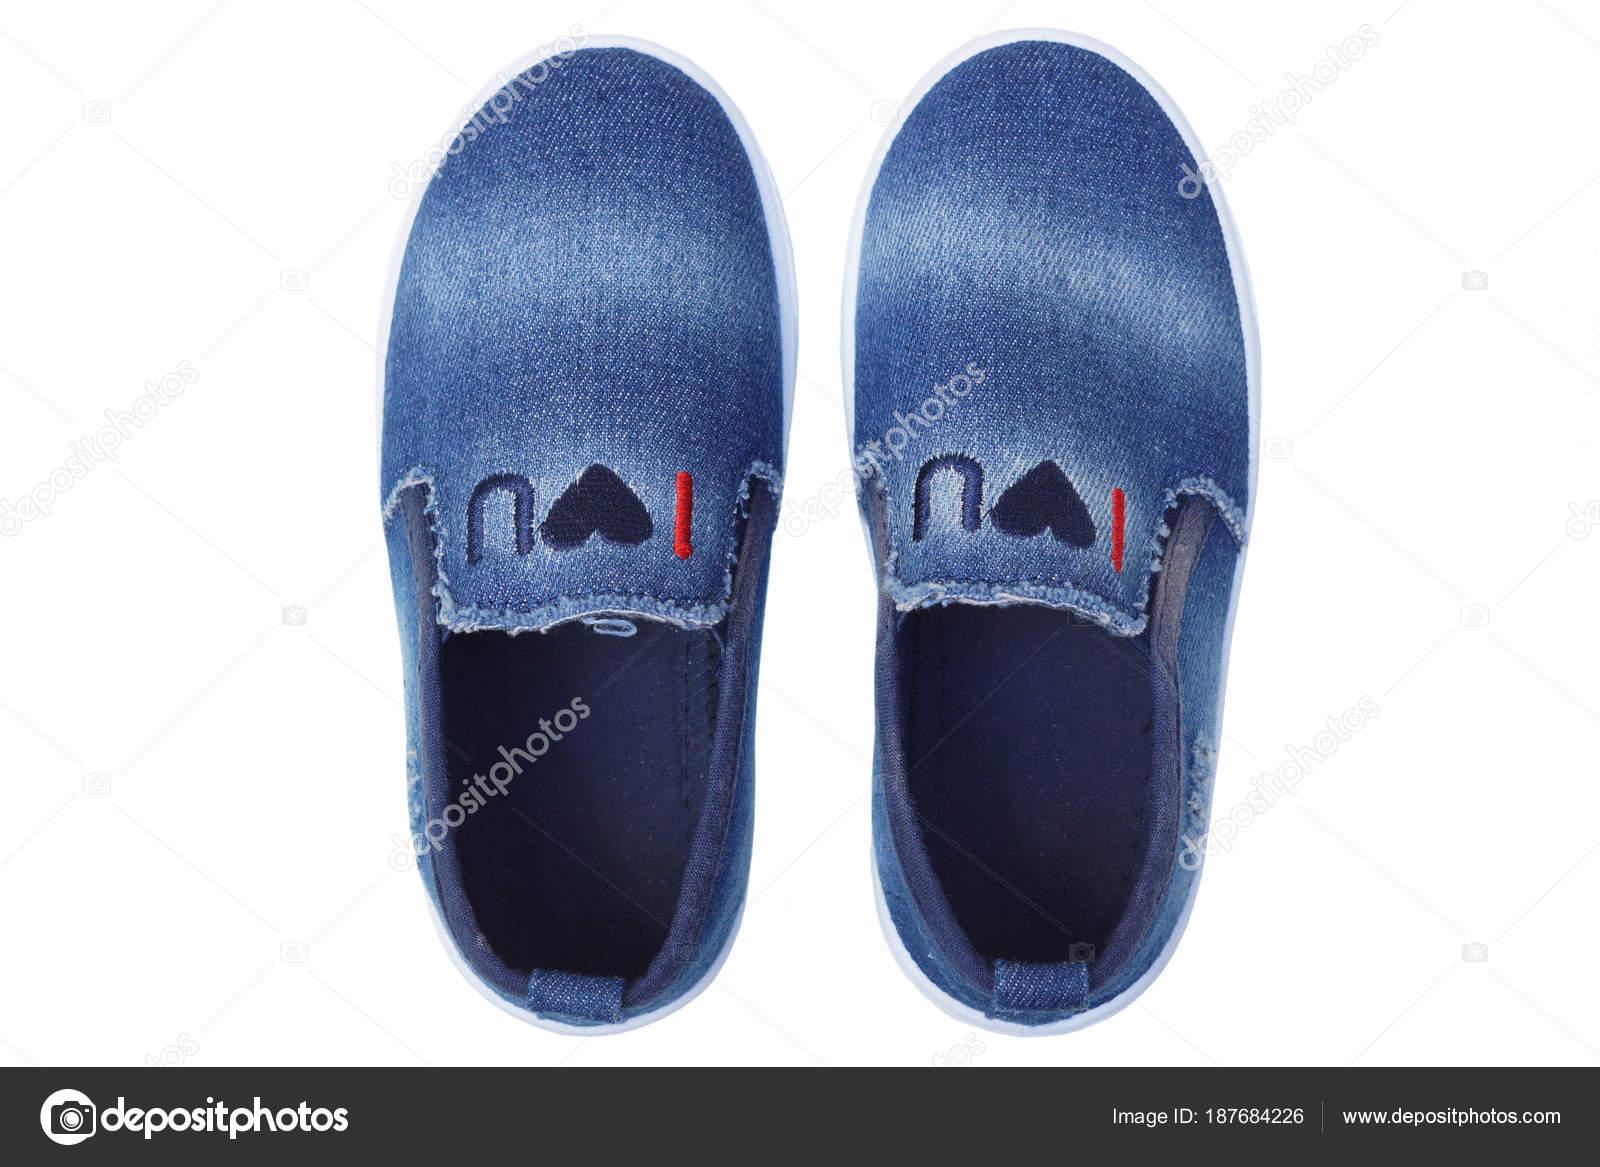 400235a1b58 Ζαν Τζιν Παντοφλέ Παπούτσια Αγάπη Σας Κείμενο — Φωτογραφία Αρχείου ...